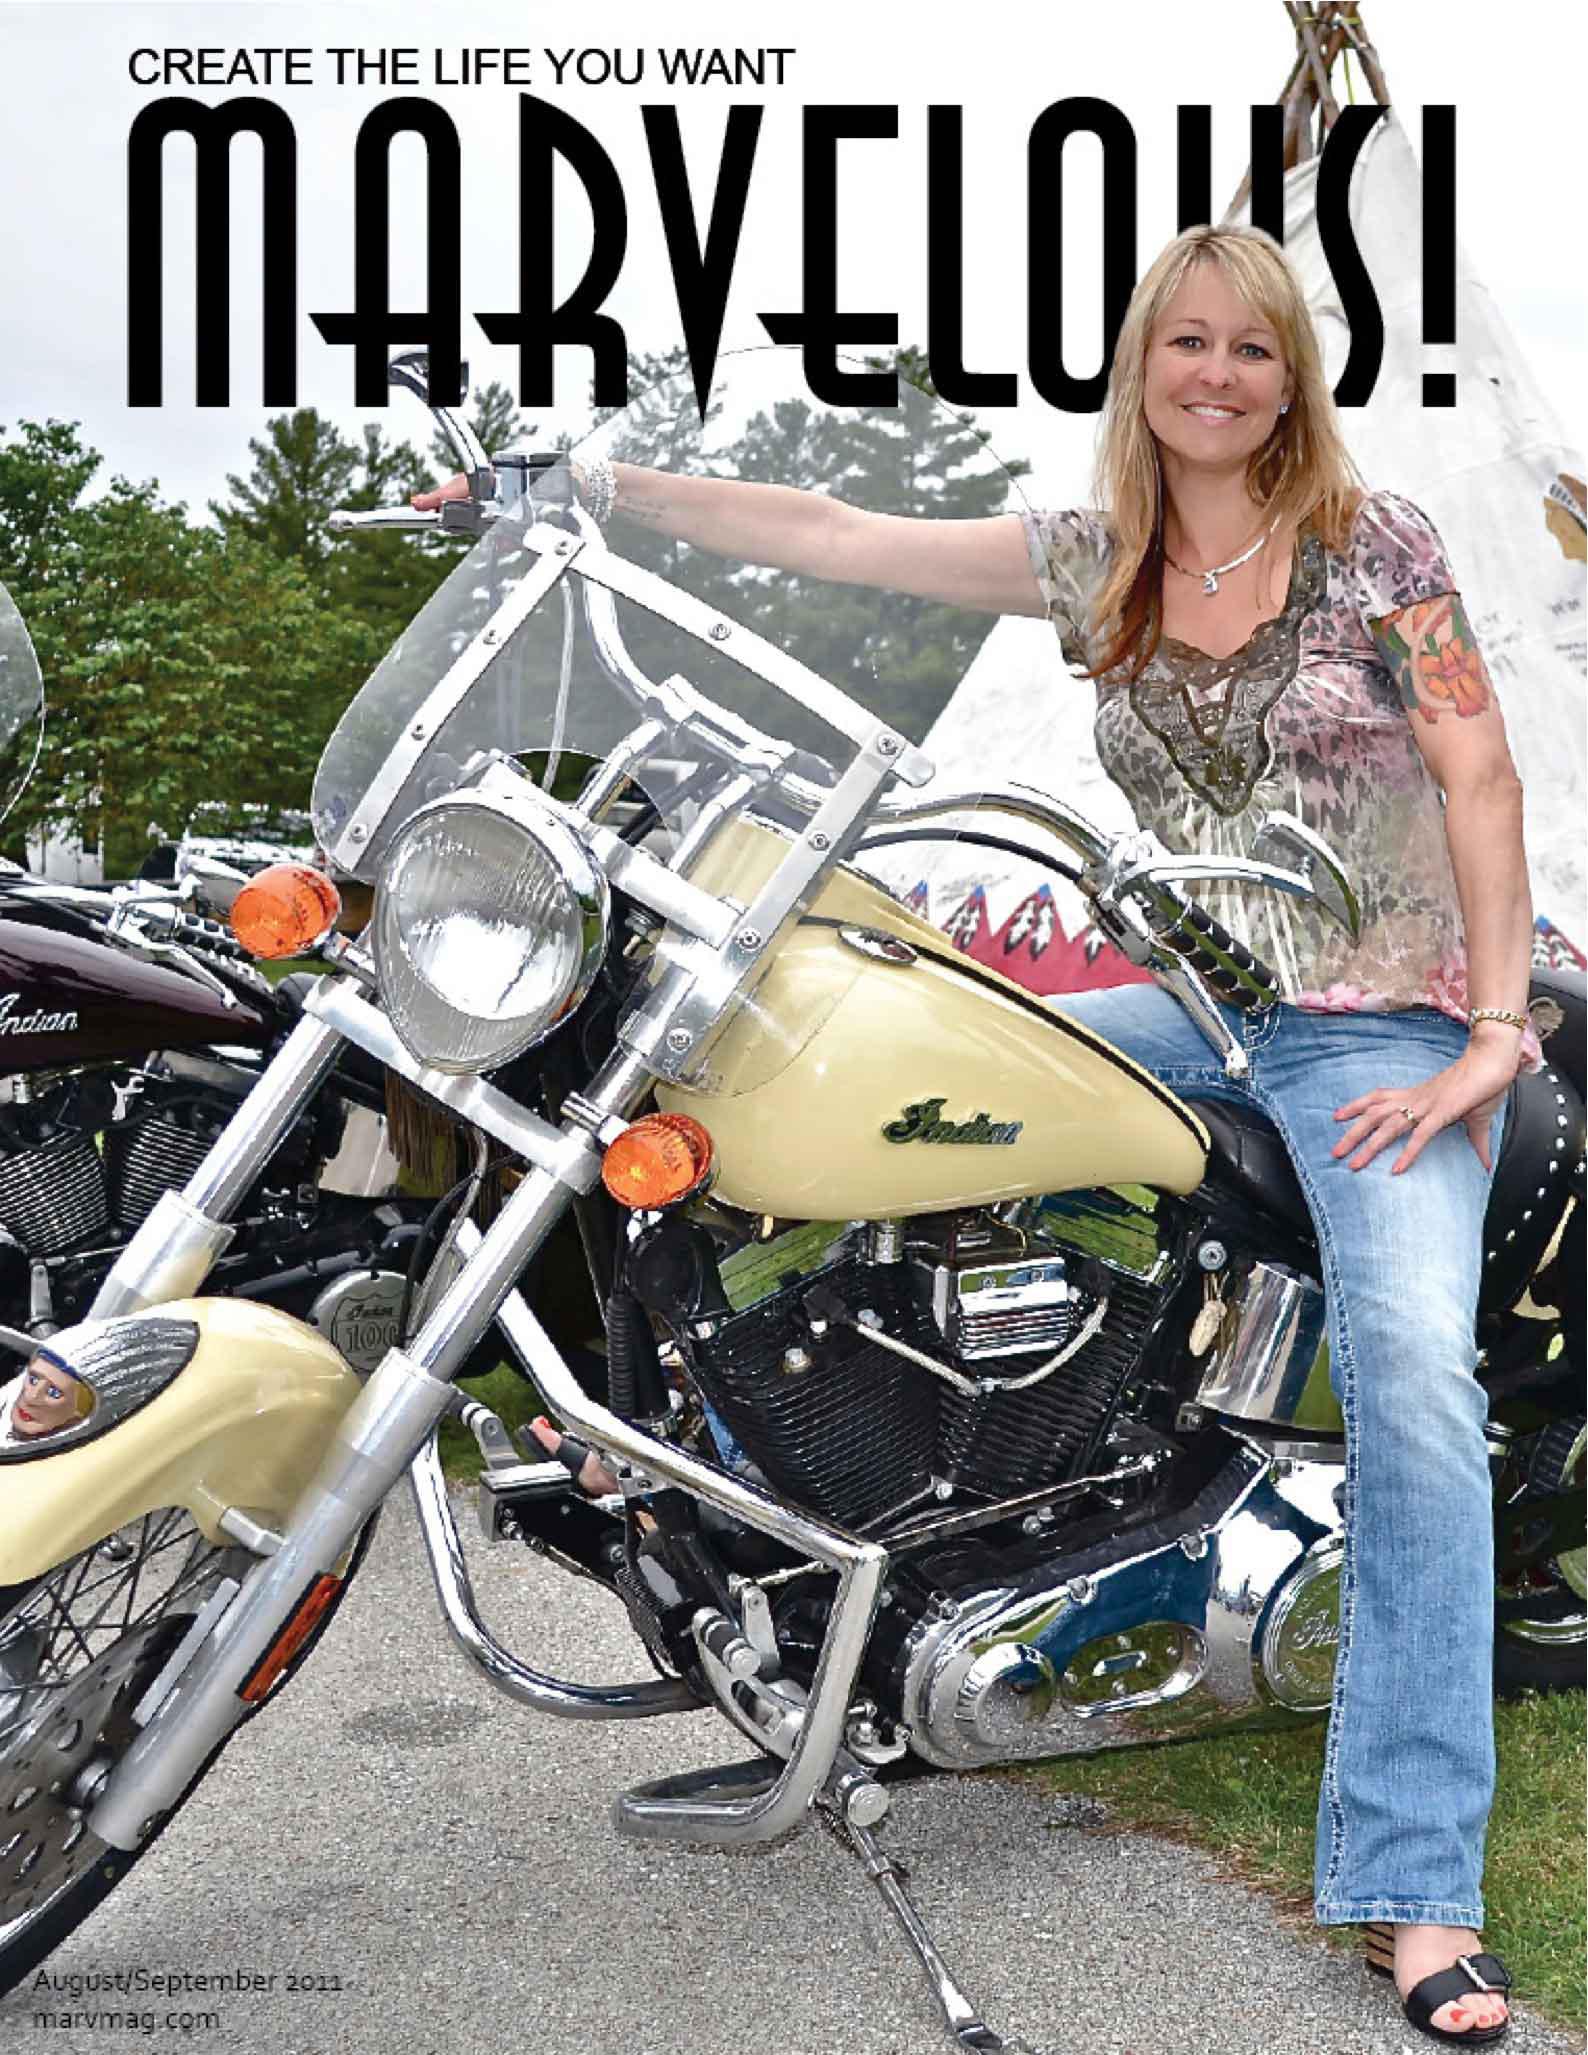 August/September 2011 — Carrie Bristoll-Groll